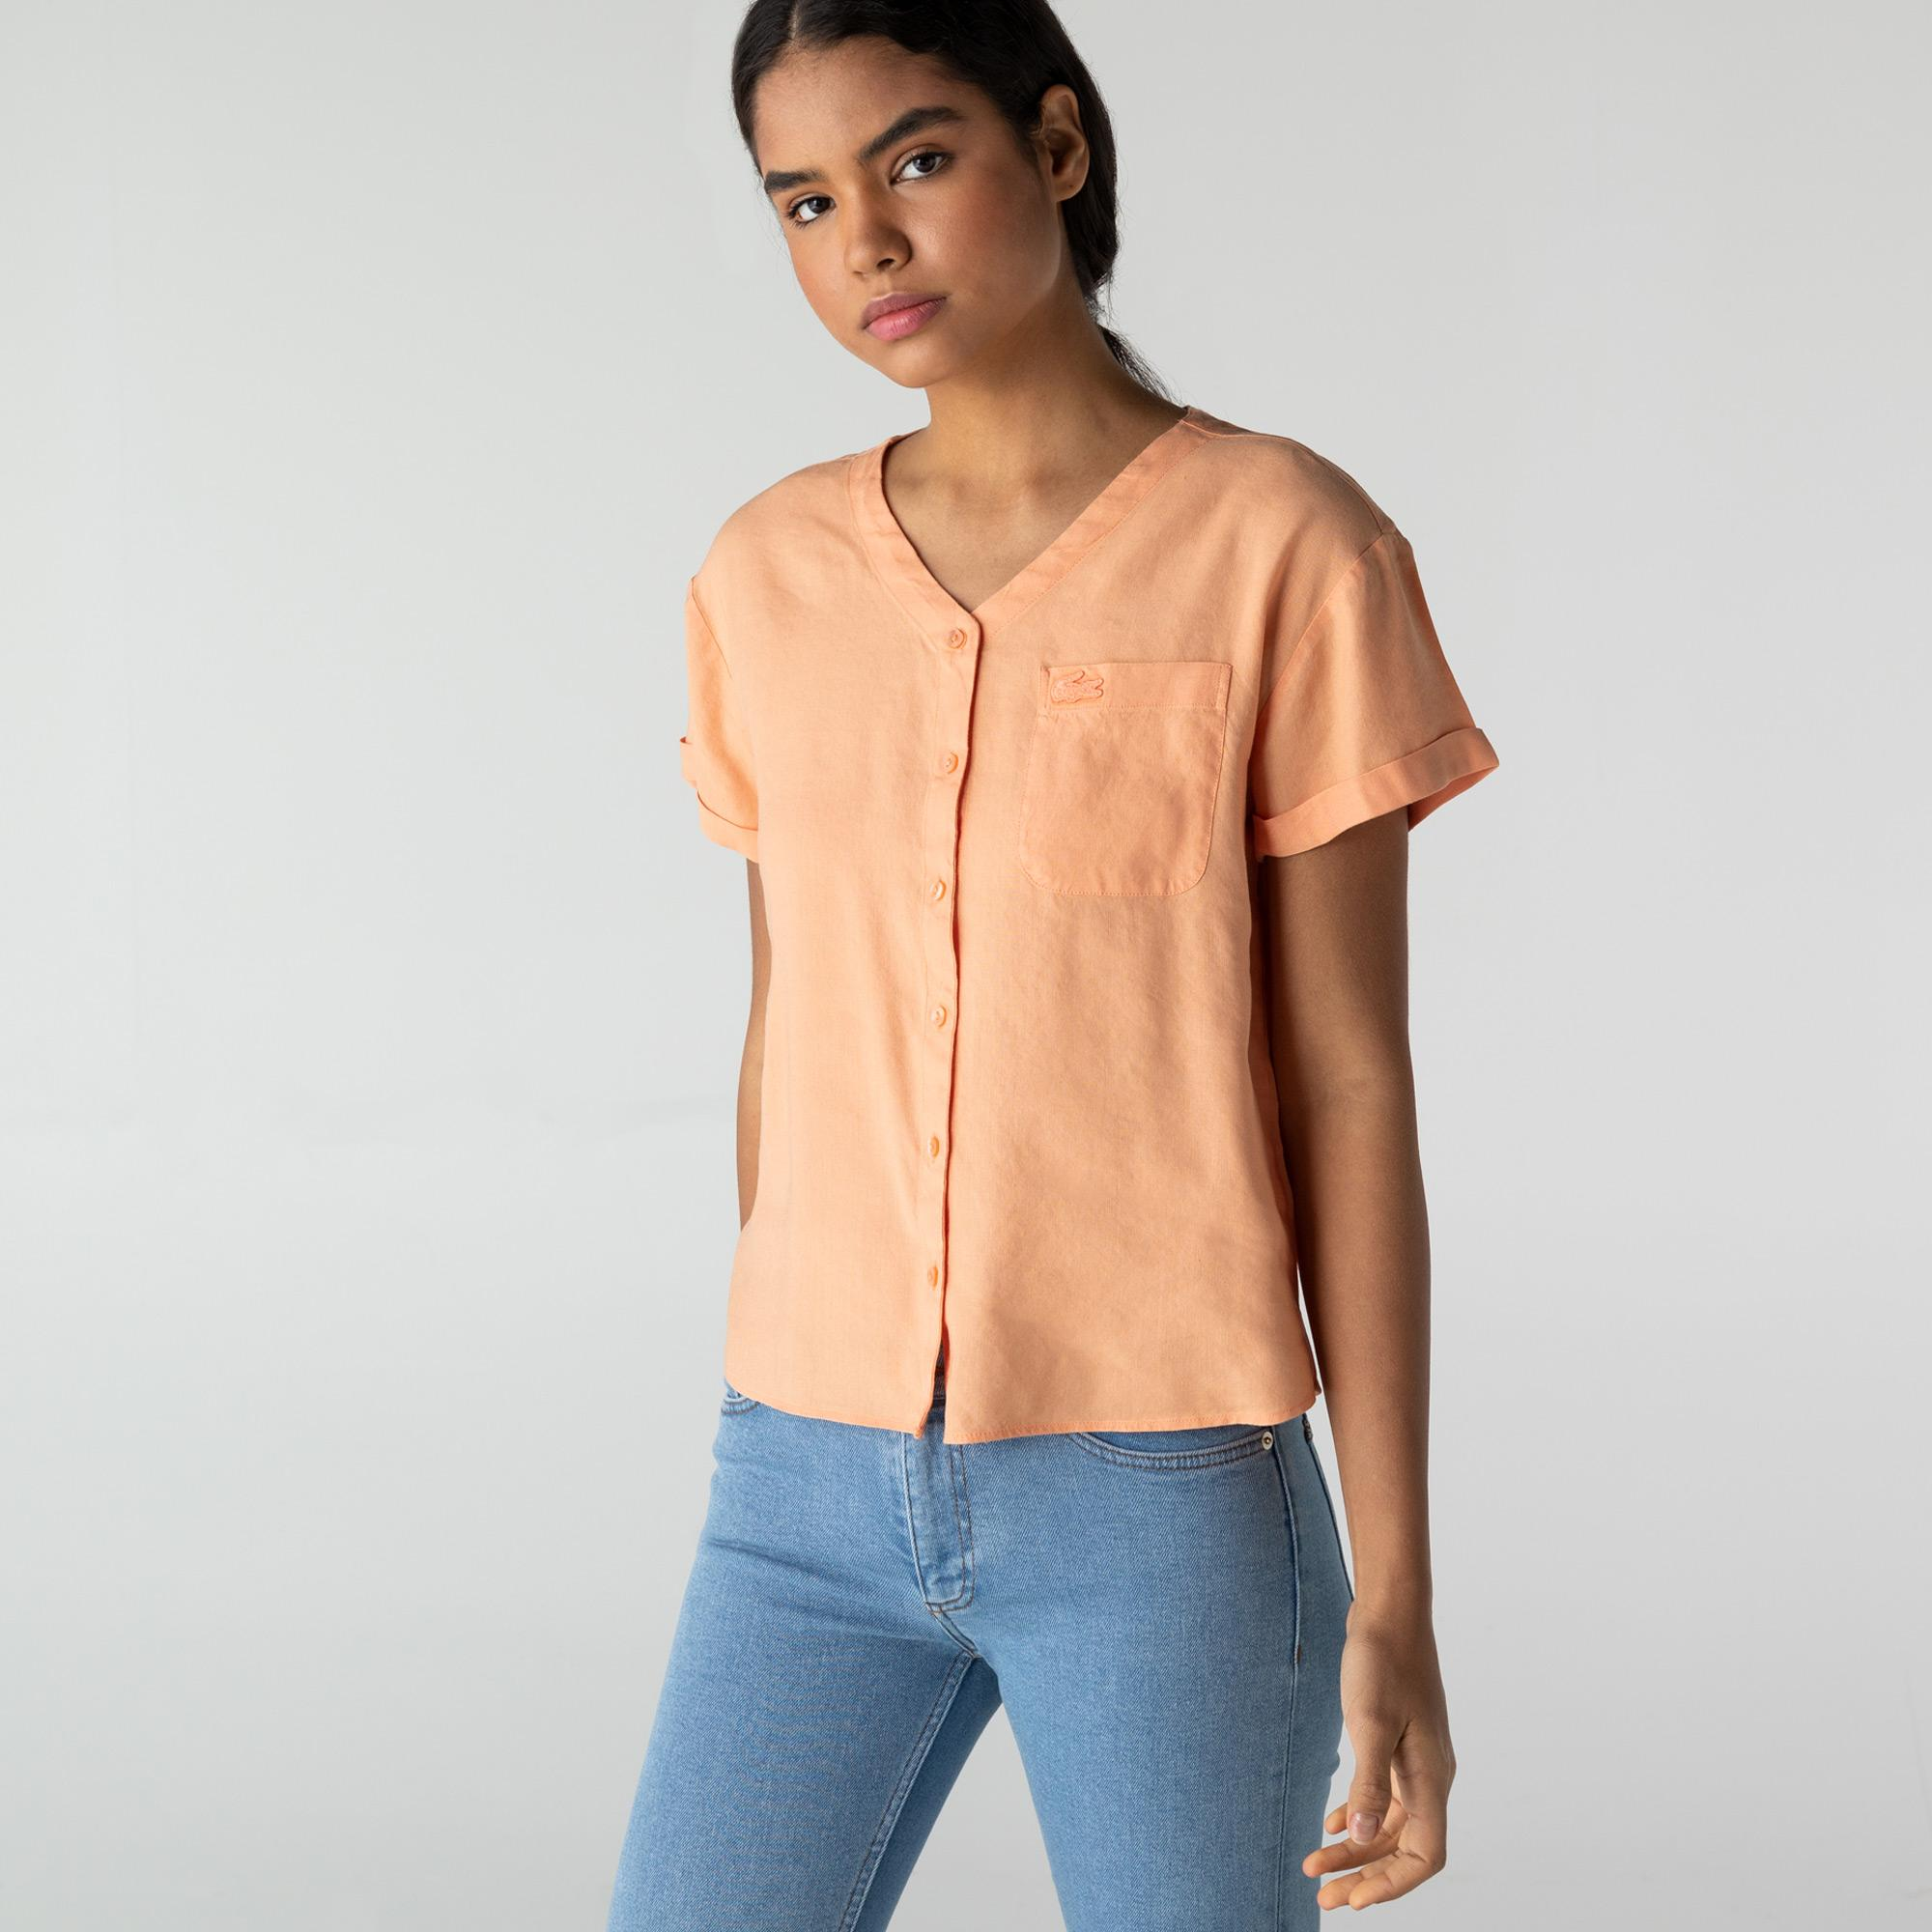 Lacoste Kadın V Yaka Pembe Gömlek